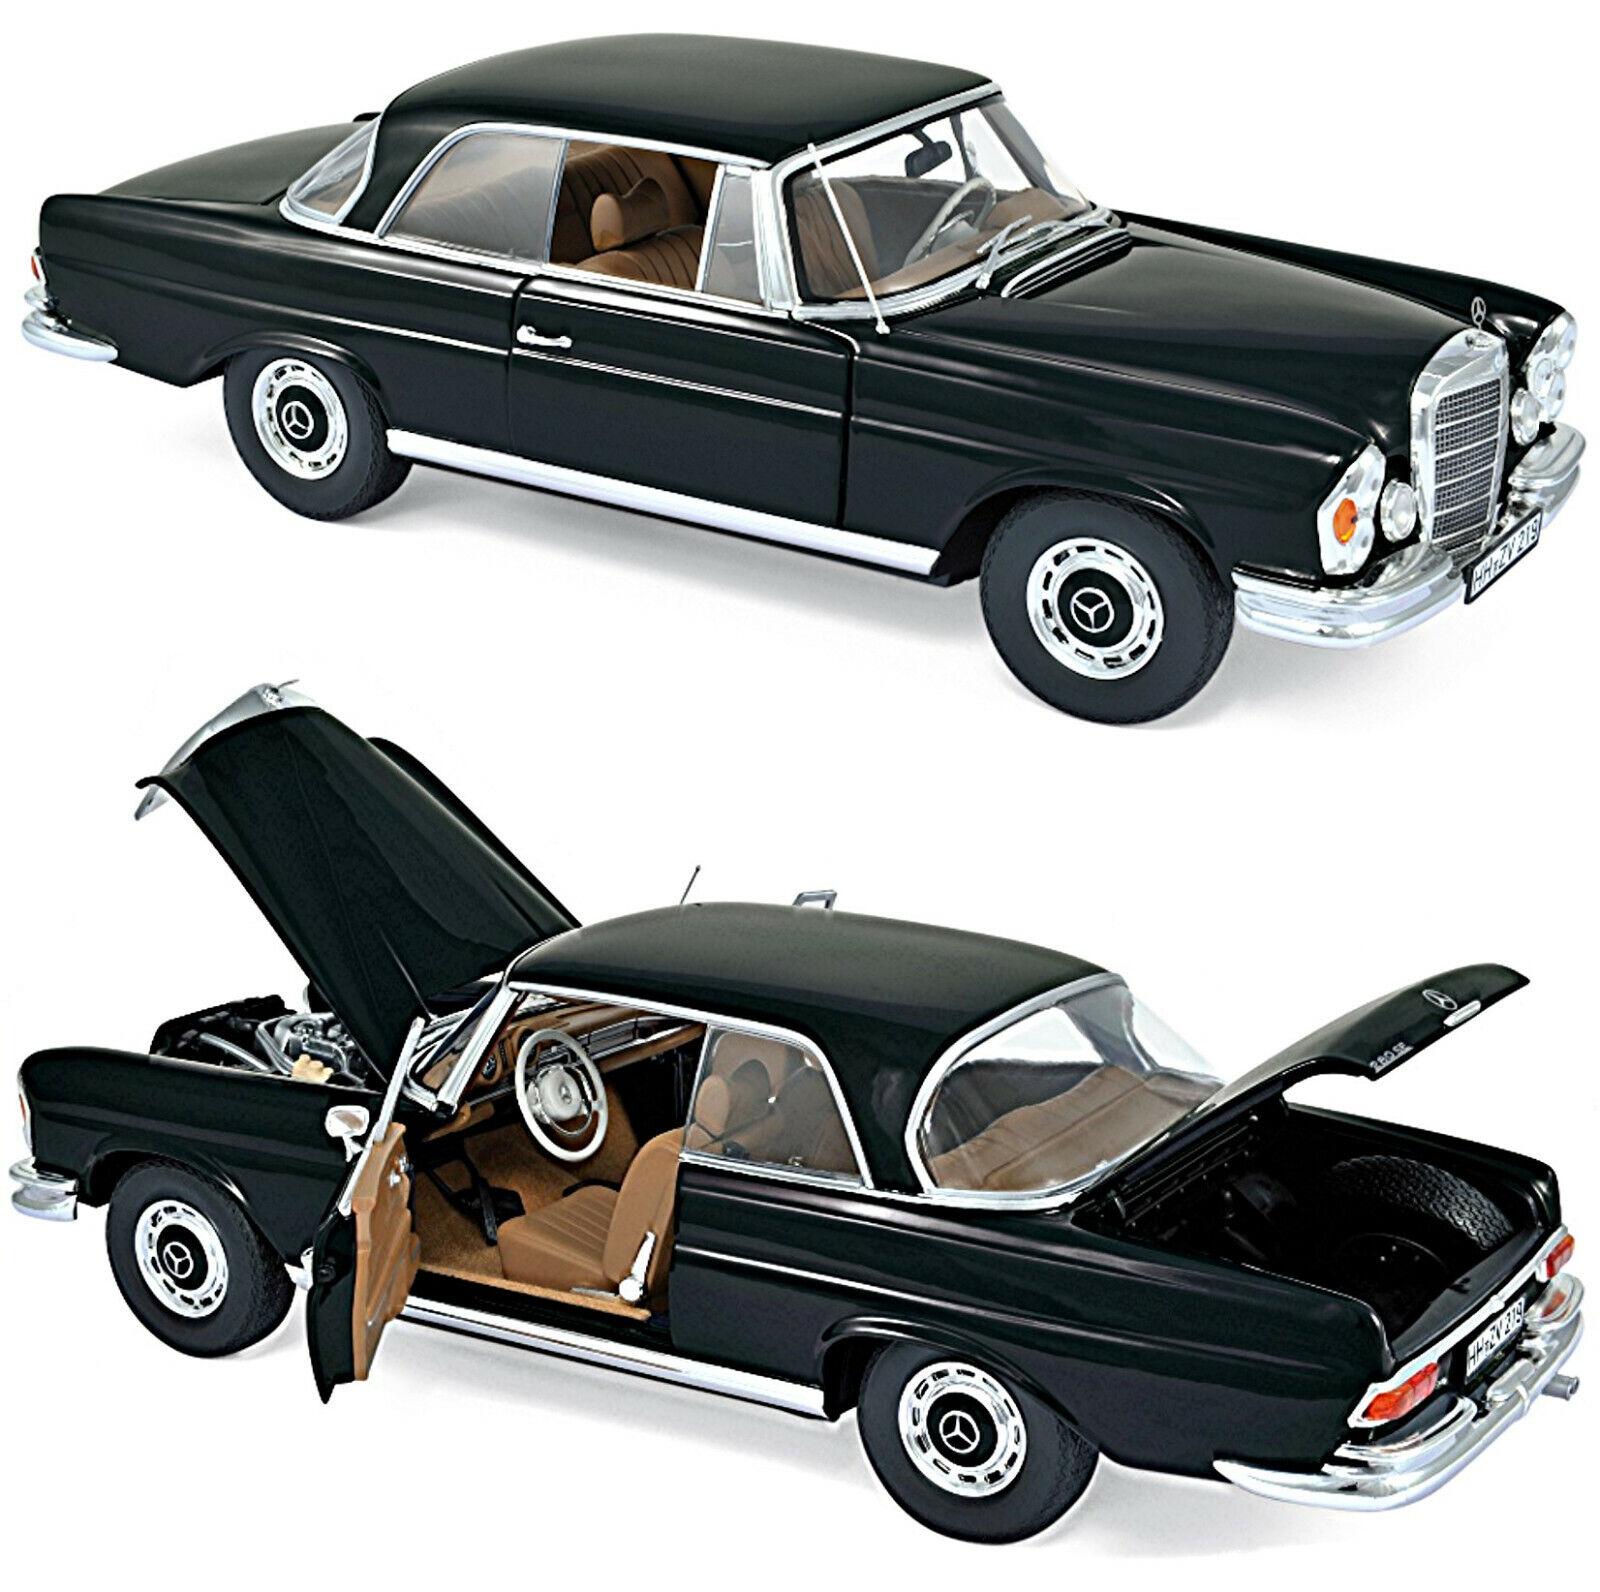 Mercedes Benz 280 se coupé w111 1969-71 negro Black 1:18 norev 183432